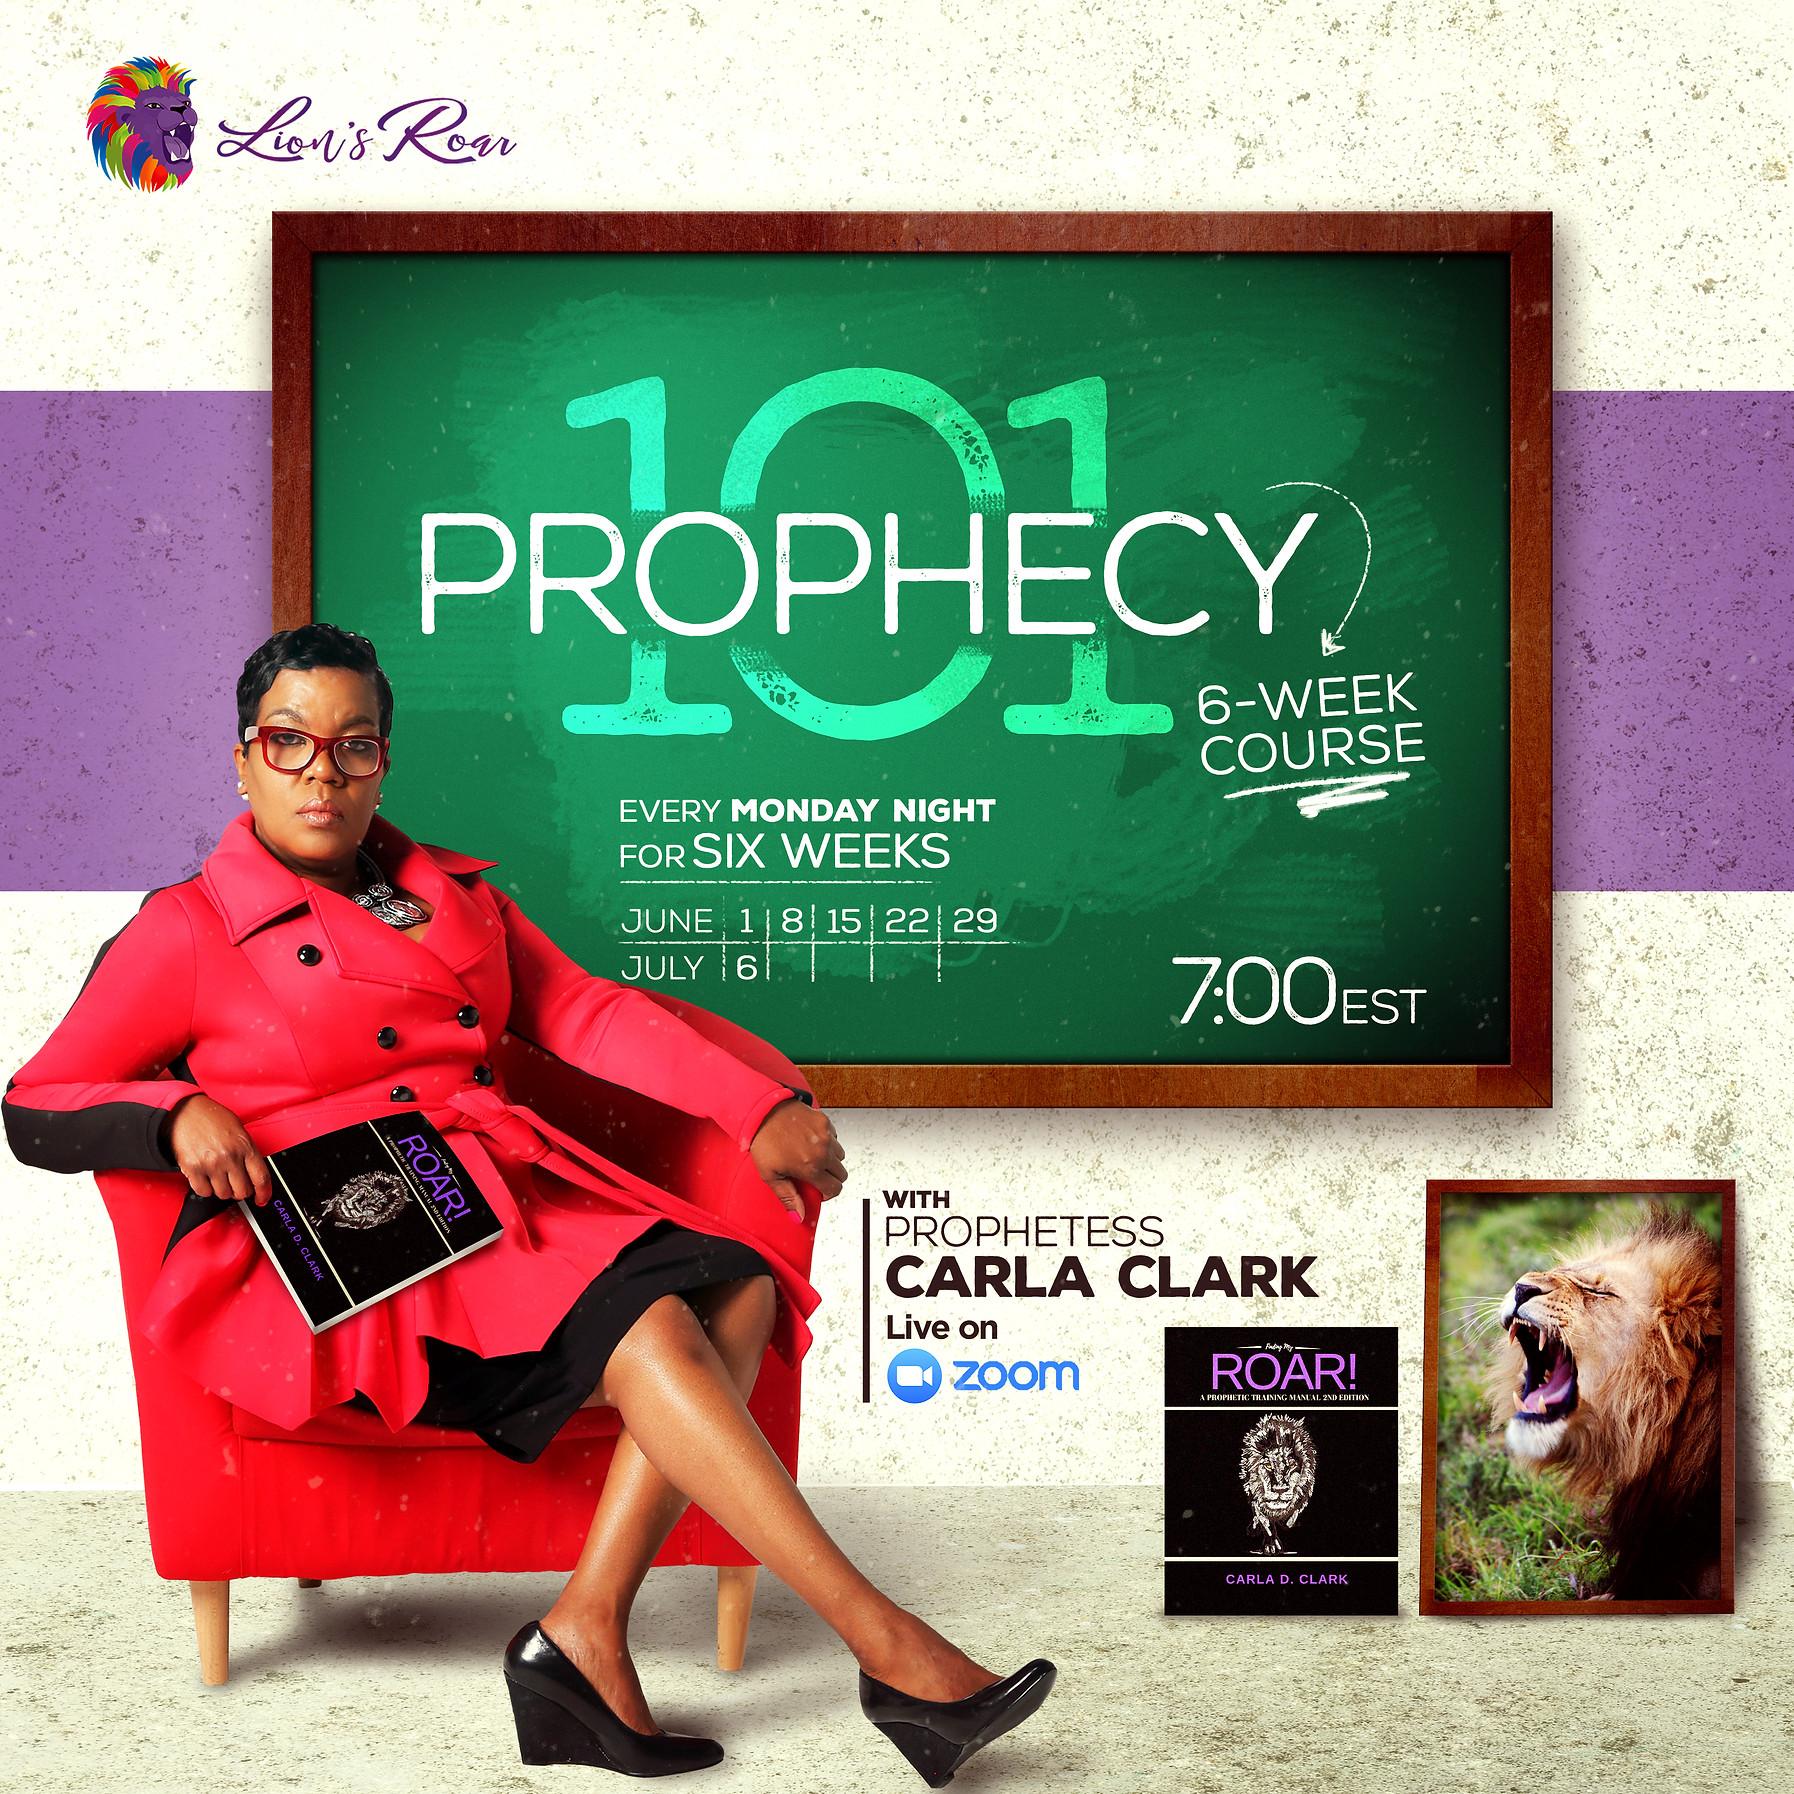 School of Prochecy